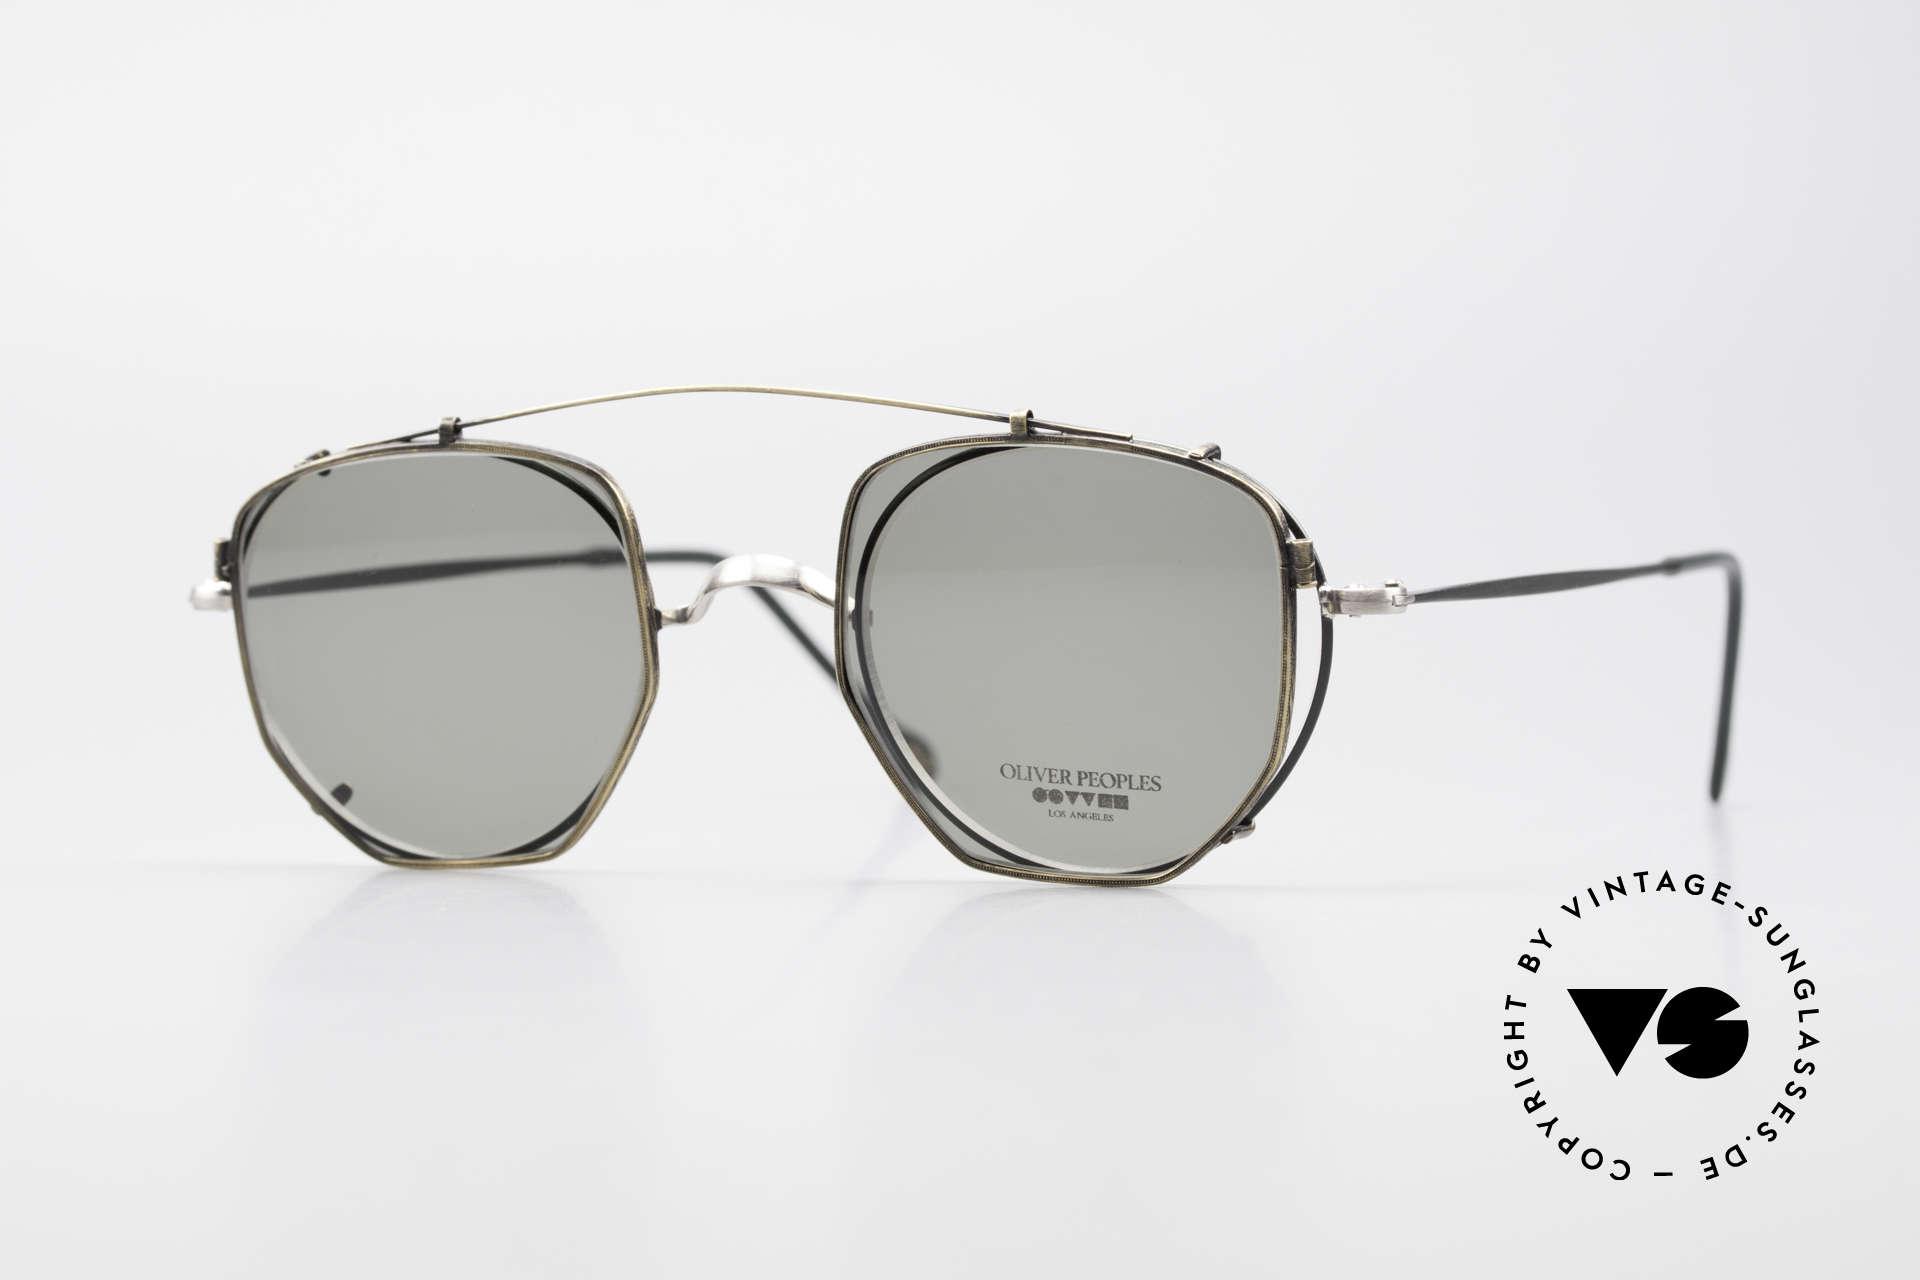 Oliver Peoples OP80BC Runde Brille Eckiger Clip On, vintage Oliver Peoples Sonnenbrille der frühen 90er, Passend für Herren und Damen